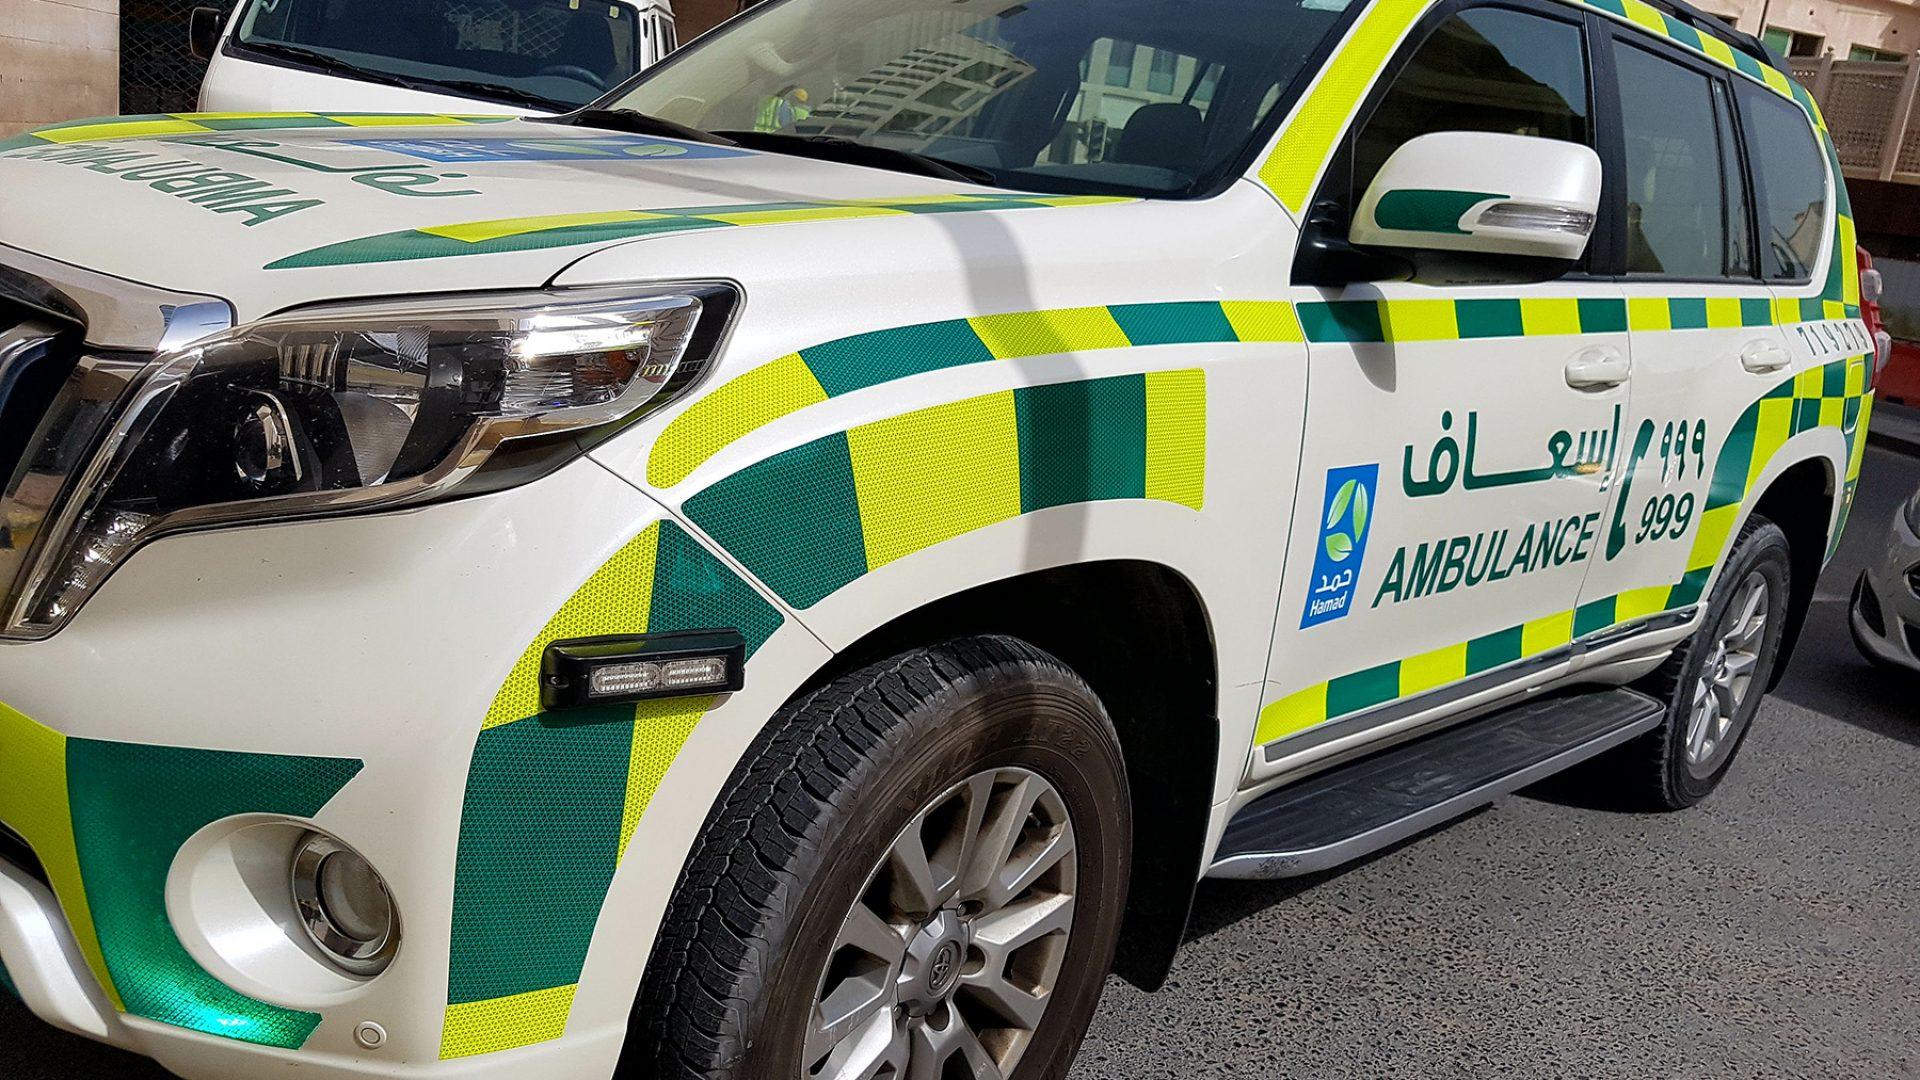 Qatar emergency numbers